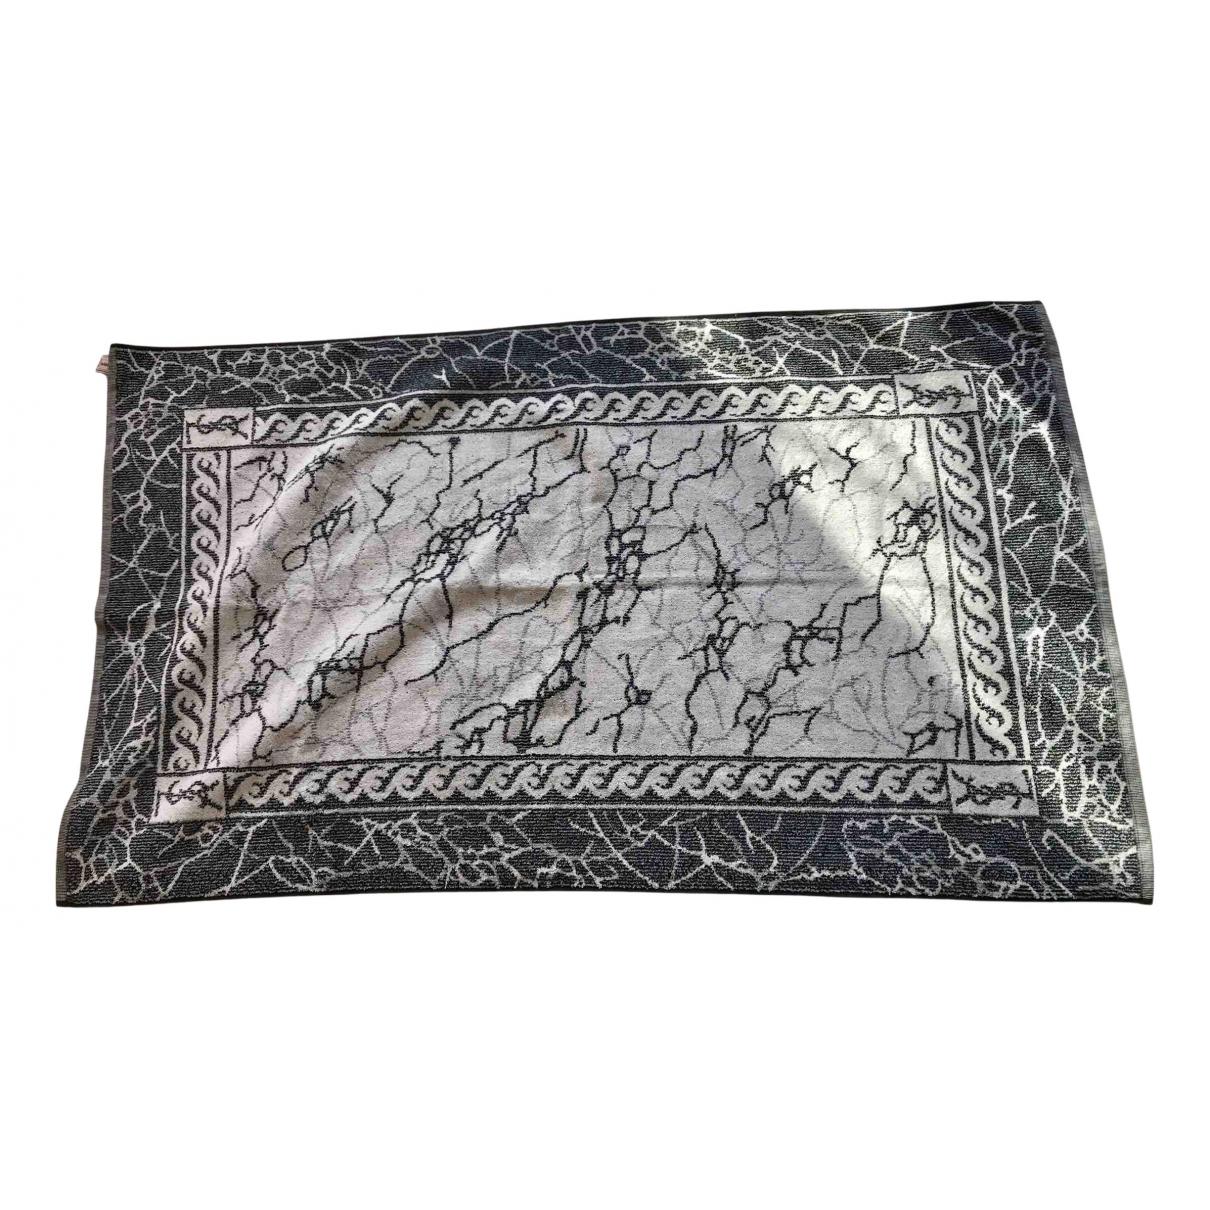 Yves Saint Laurent N Blue Cotton Textiles for Life & Living N